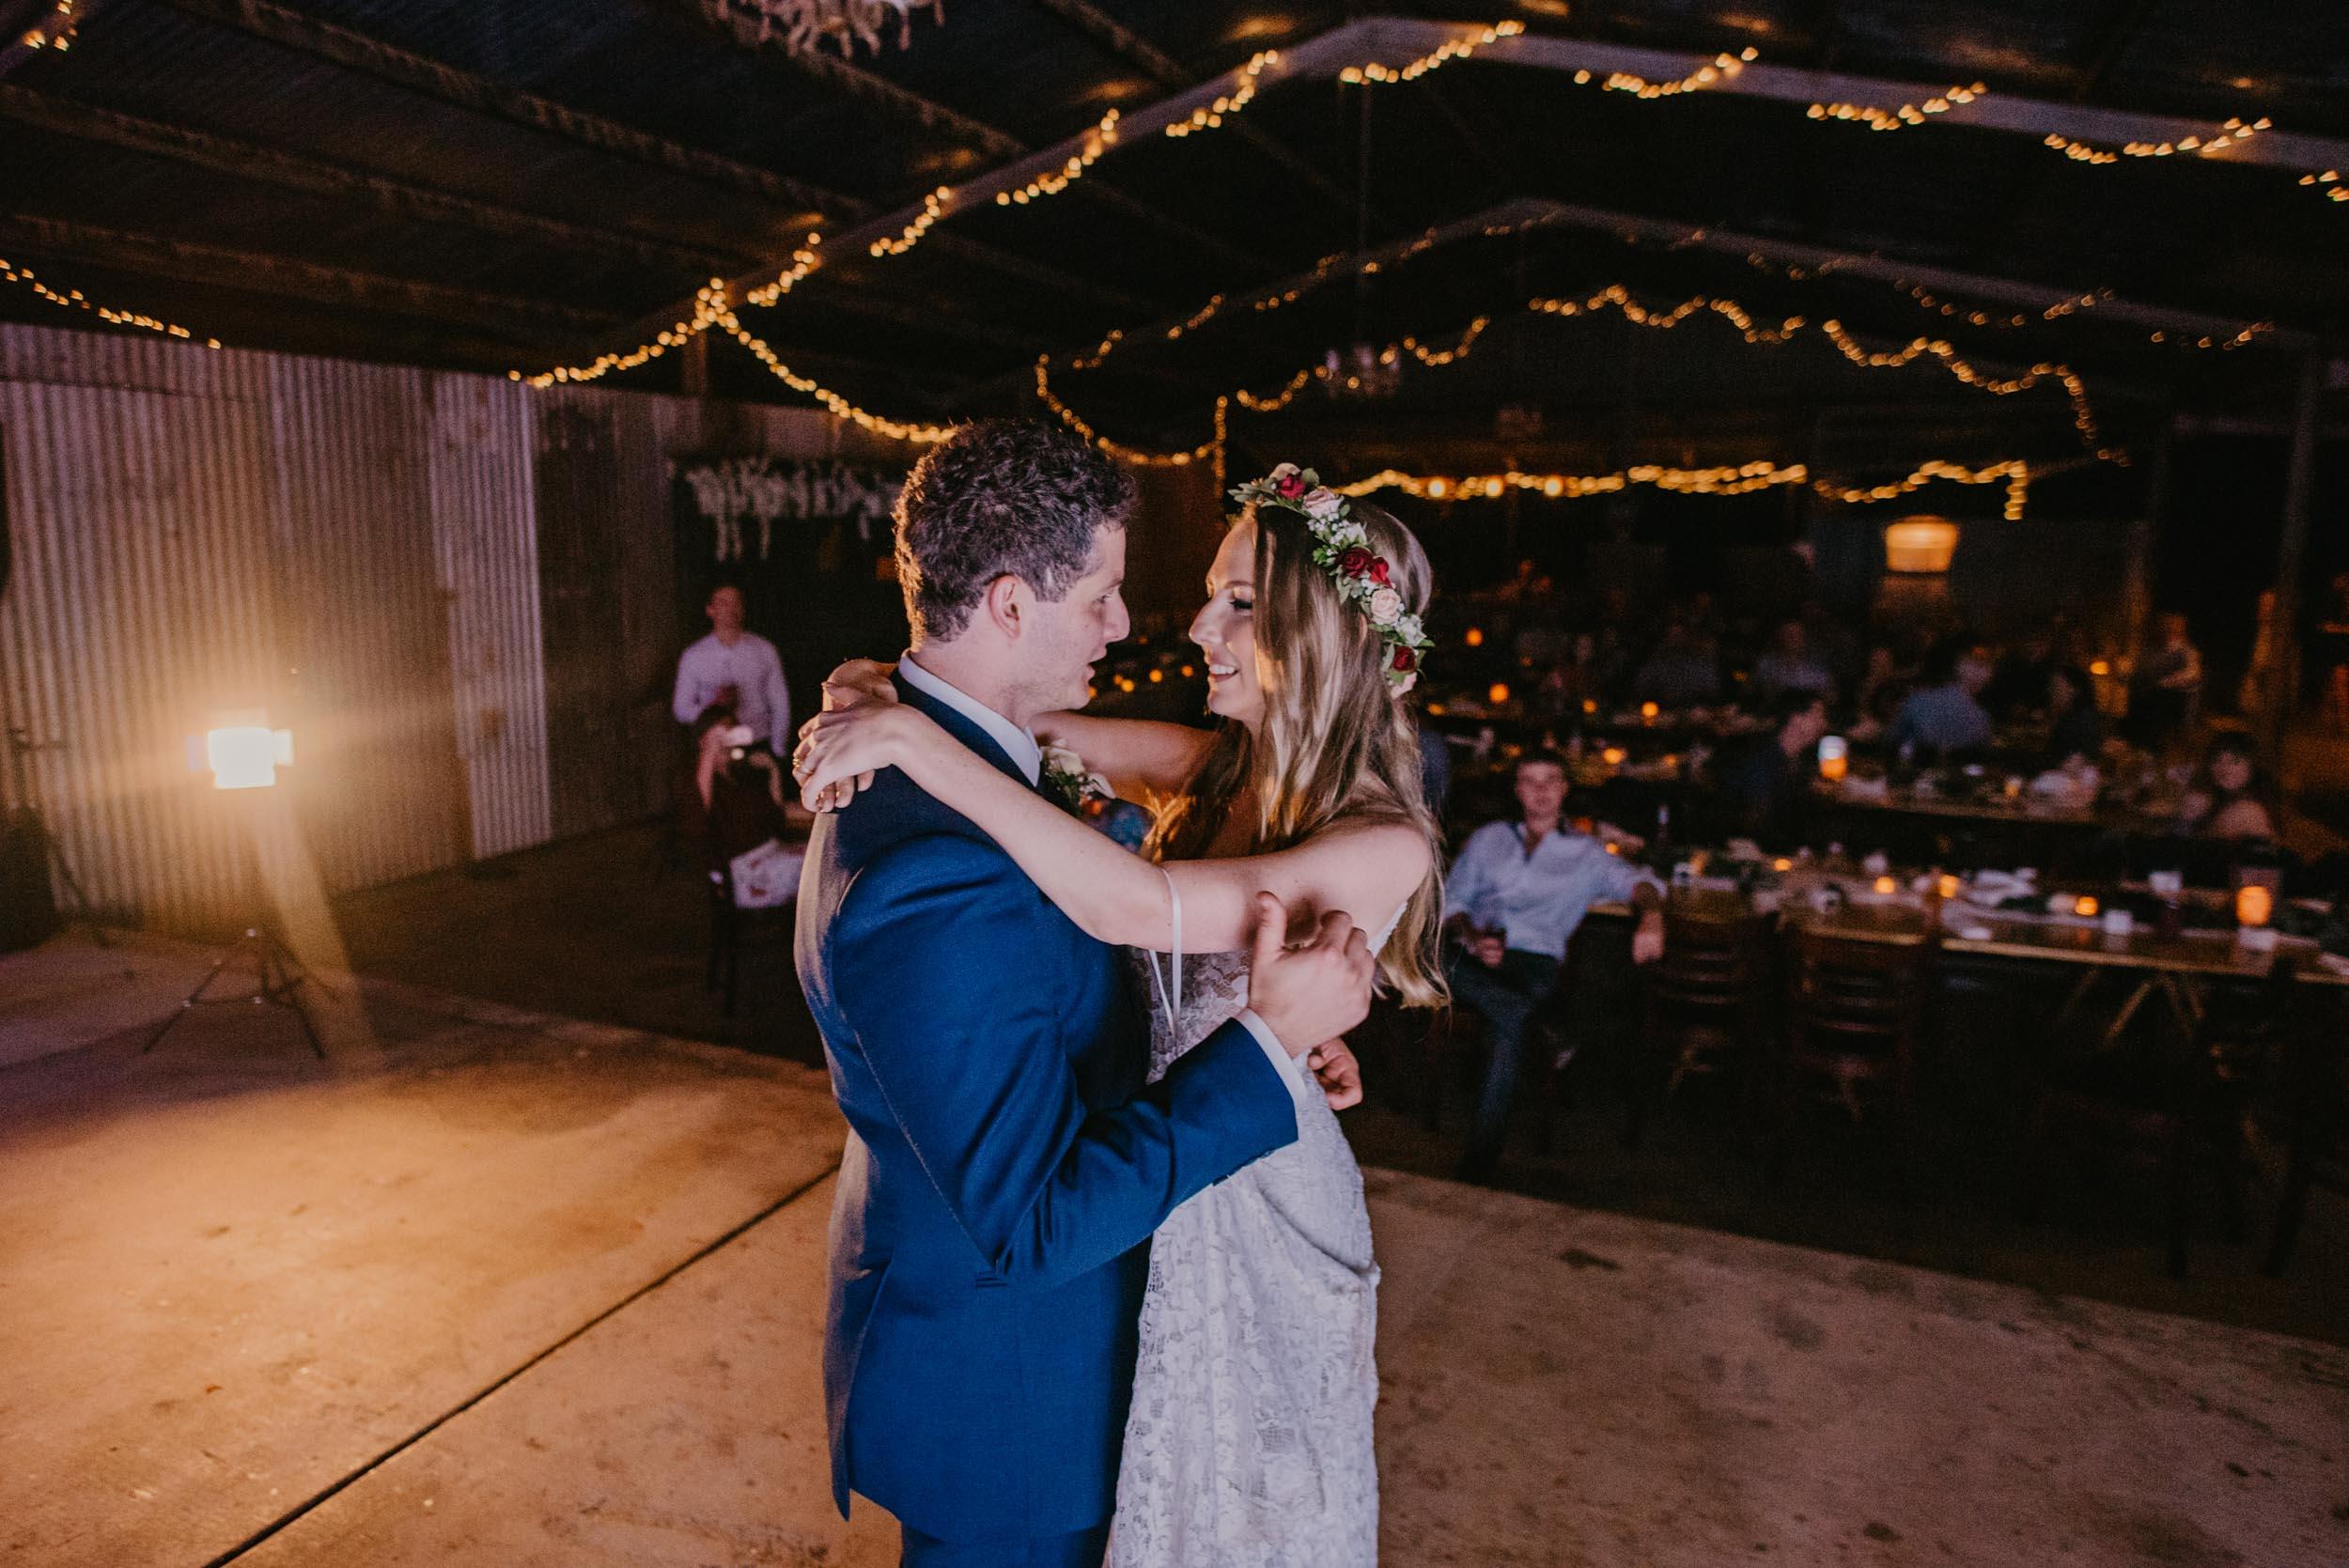 The Raw Photographer - Cairns Wedding Photographer - Laloli - Cairns Garden Ceremony - Cane Fields Photo Shoot-70.jpg